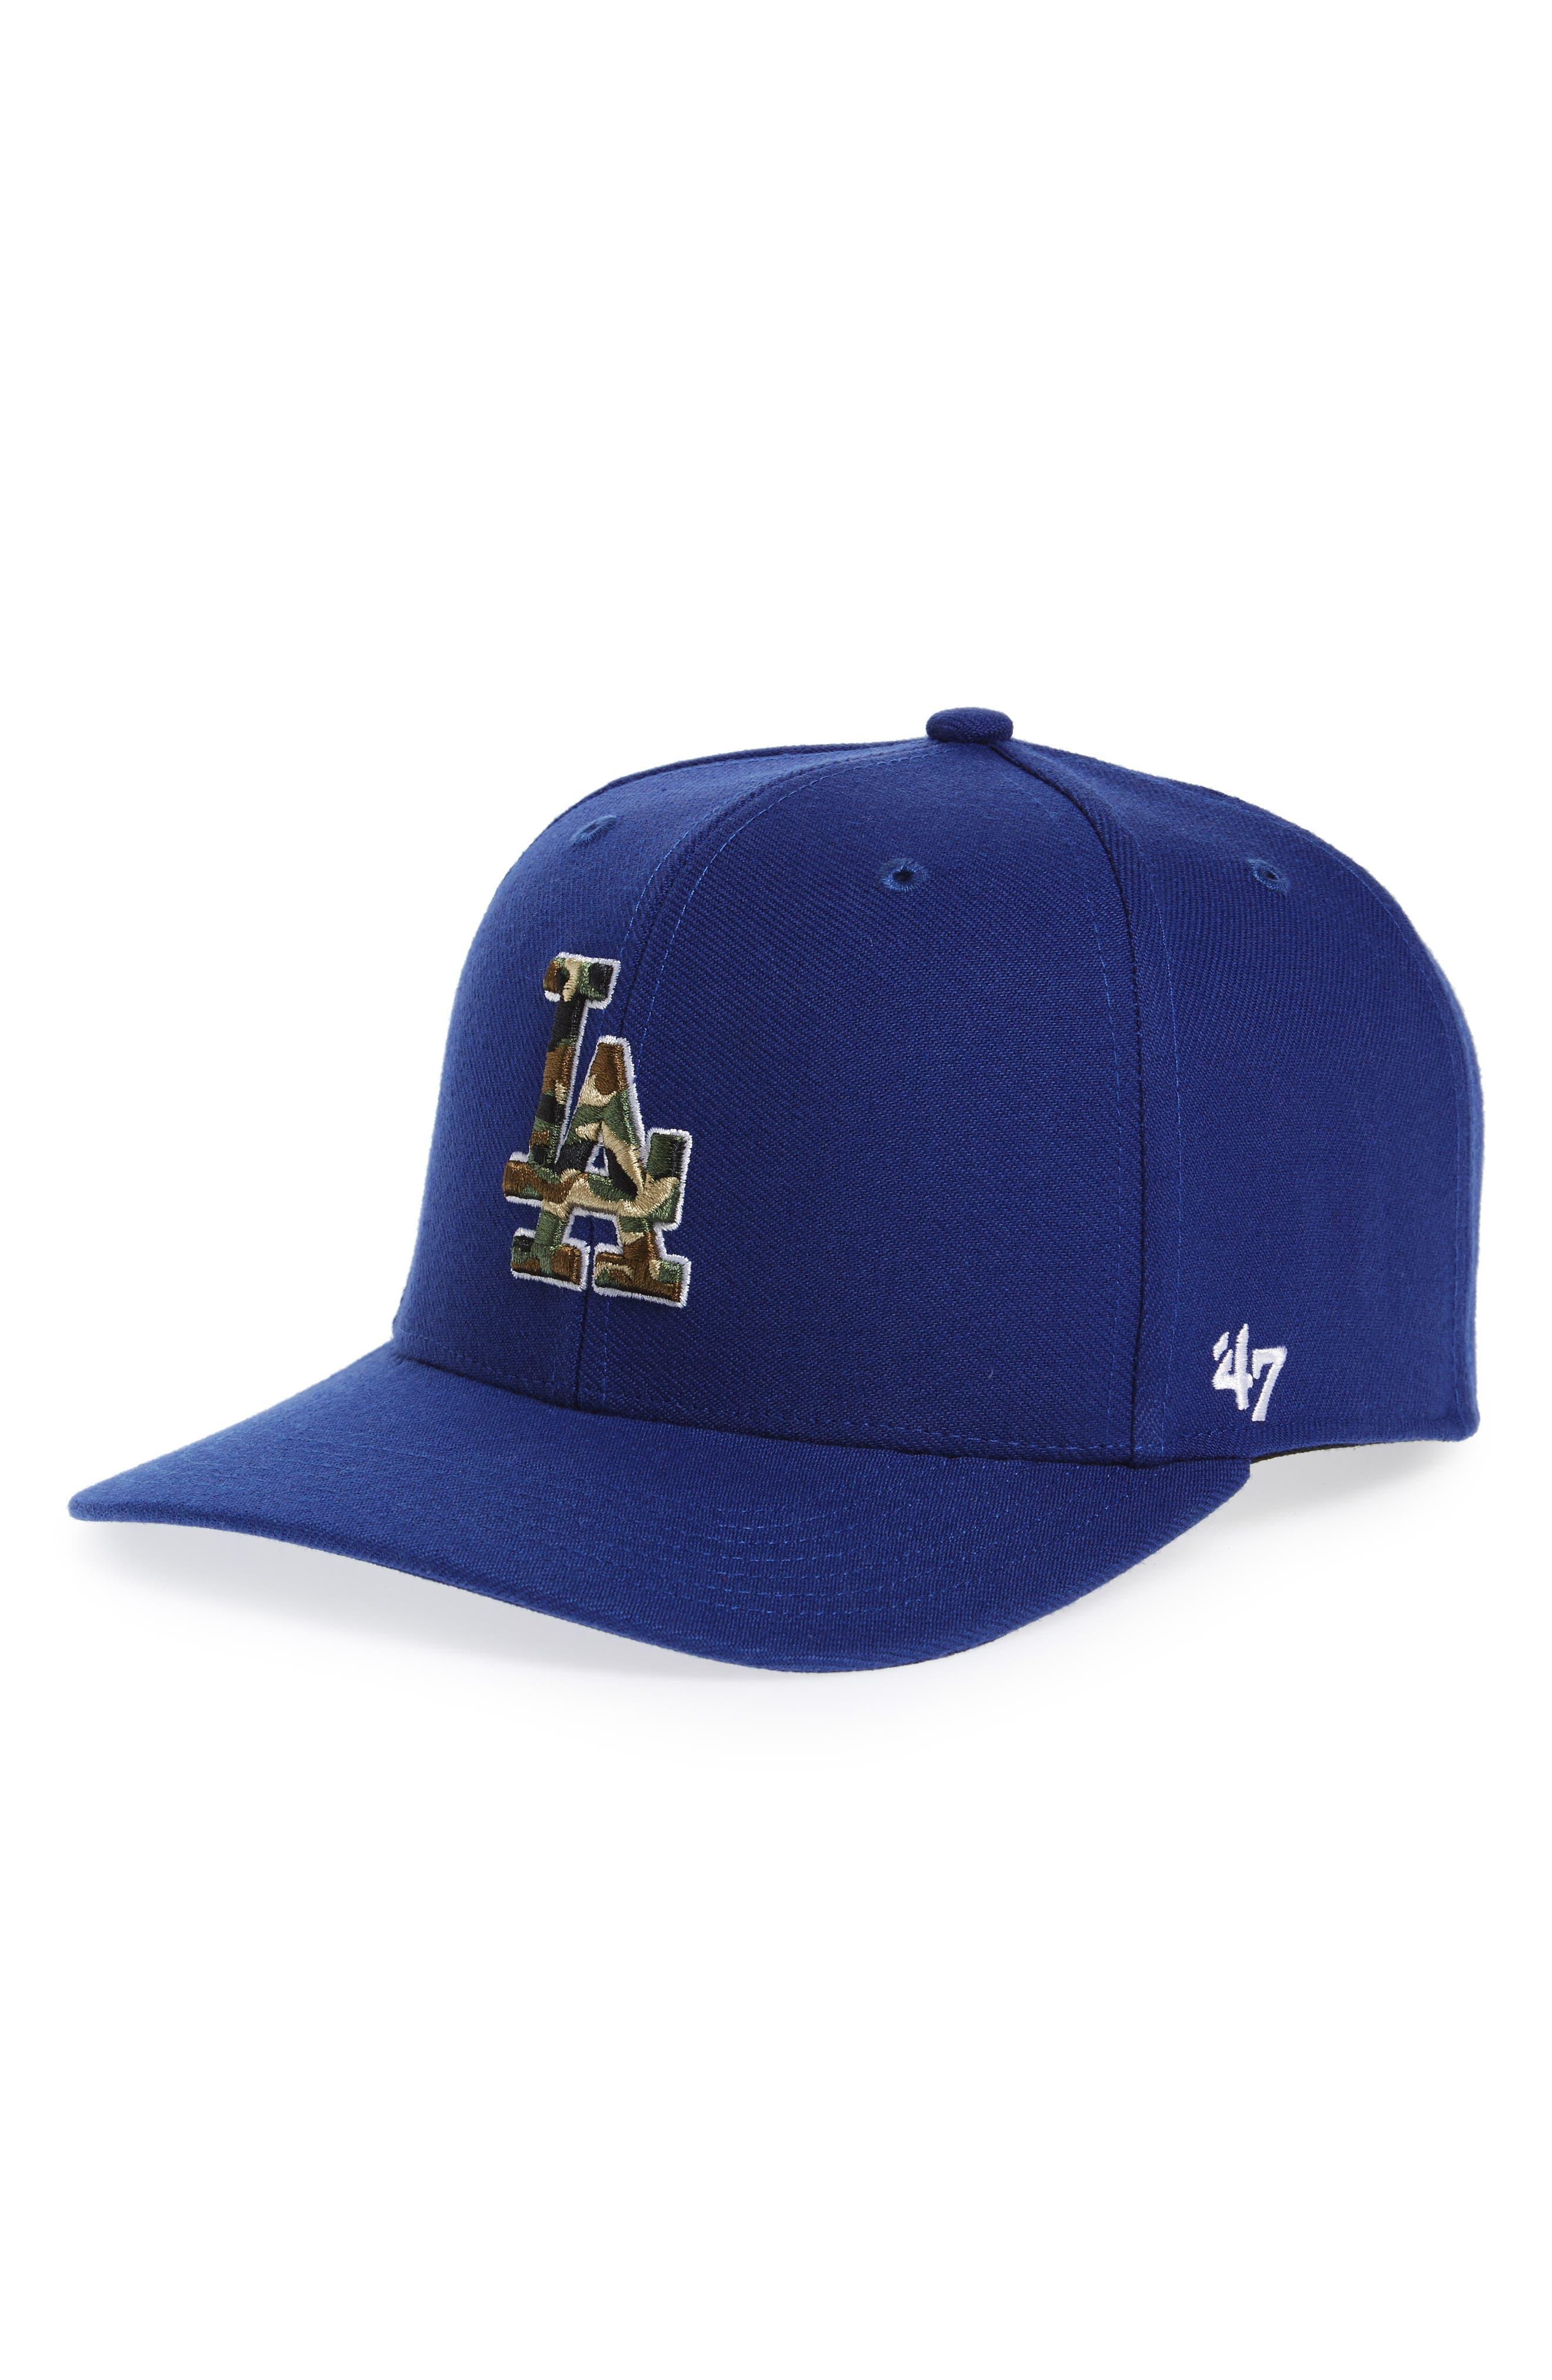 Main Image - '47 Brand Los Angeles Dodgers - Camouflage Baseball Cap